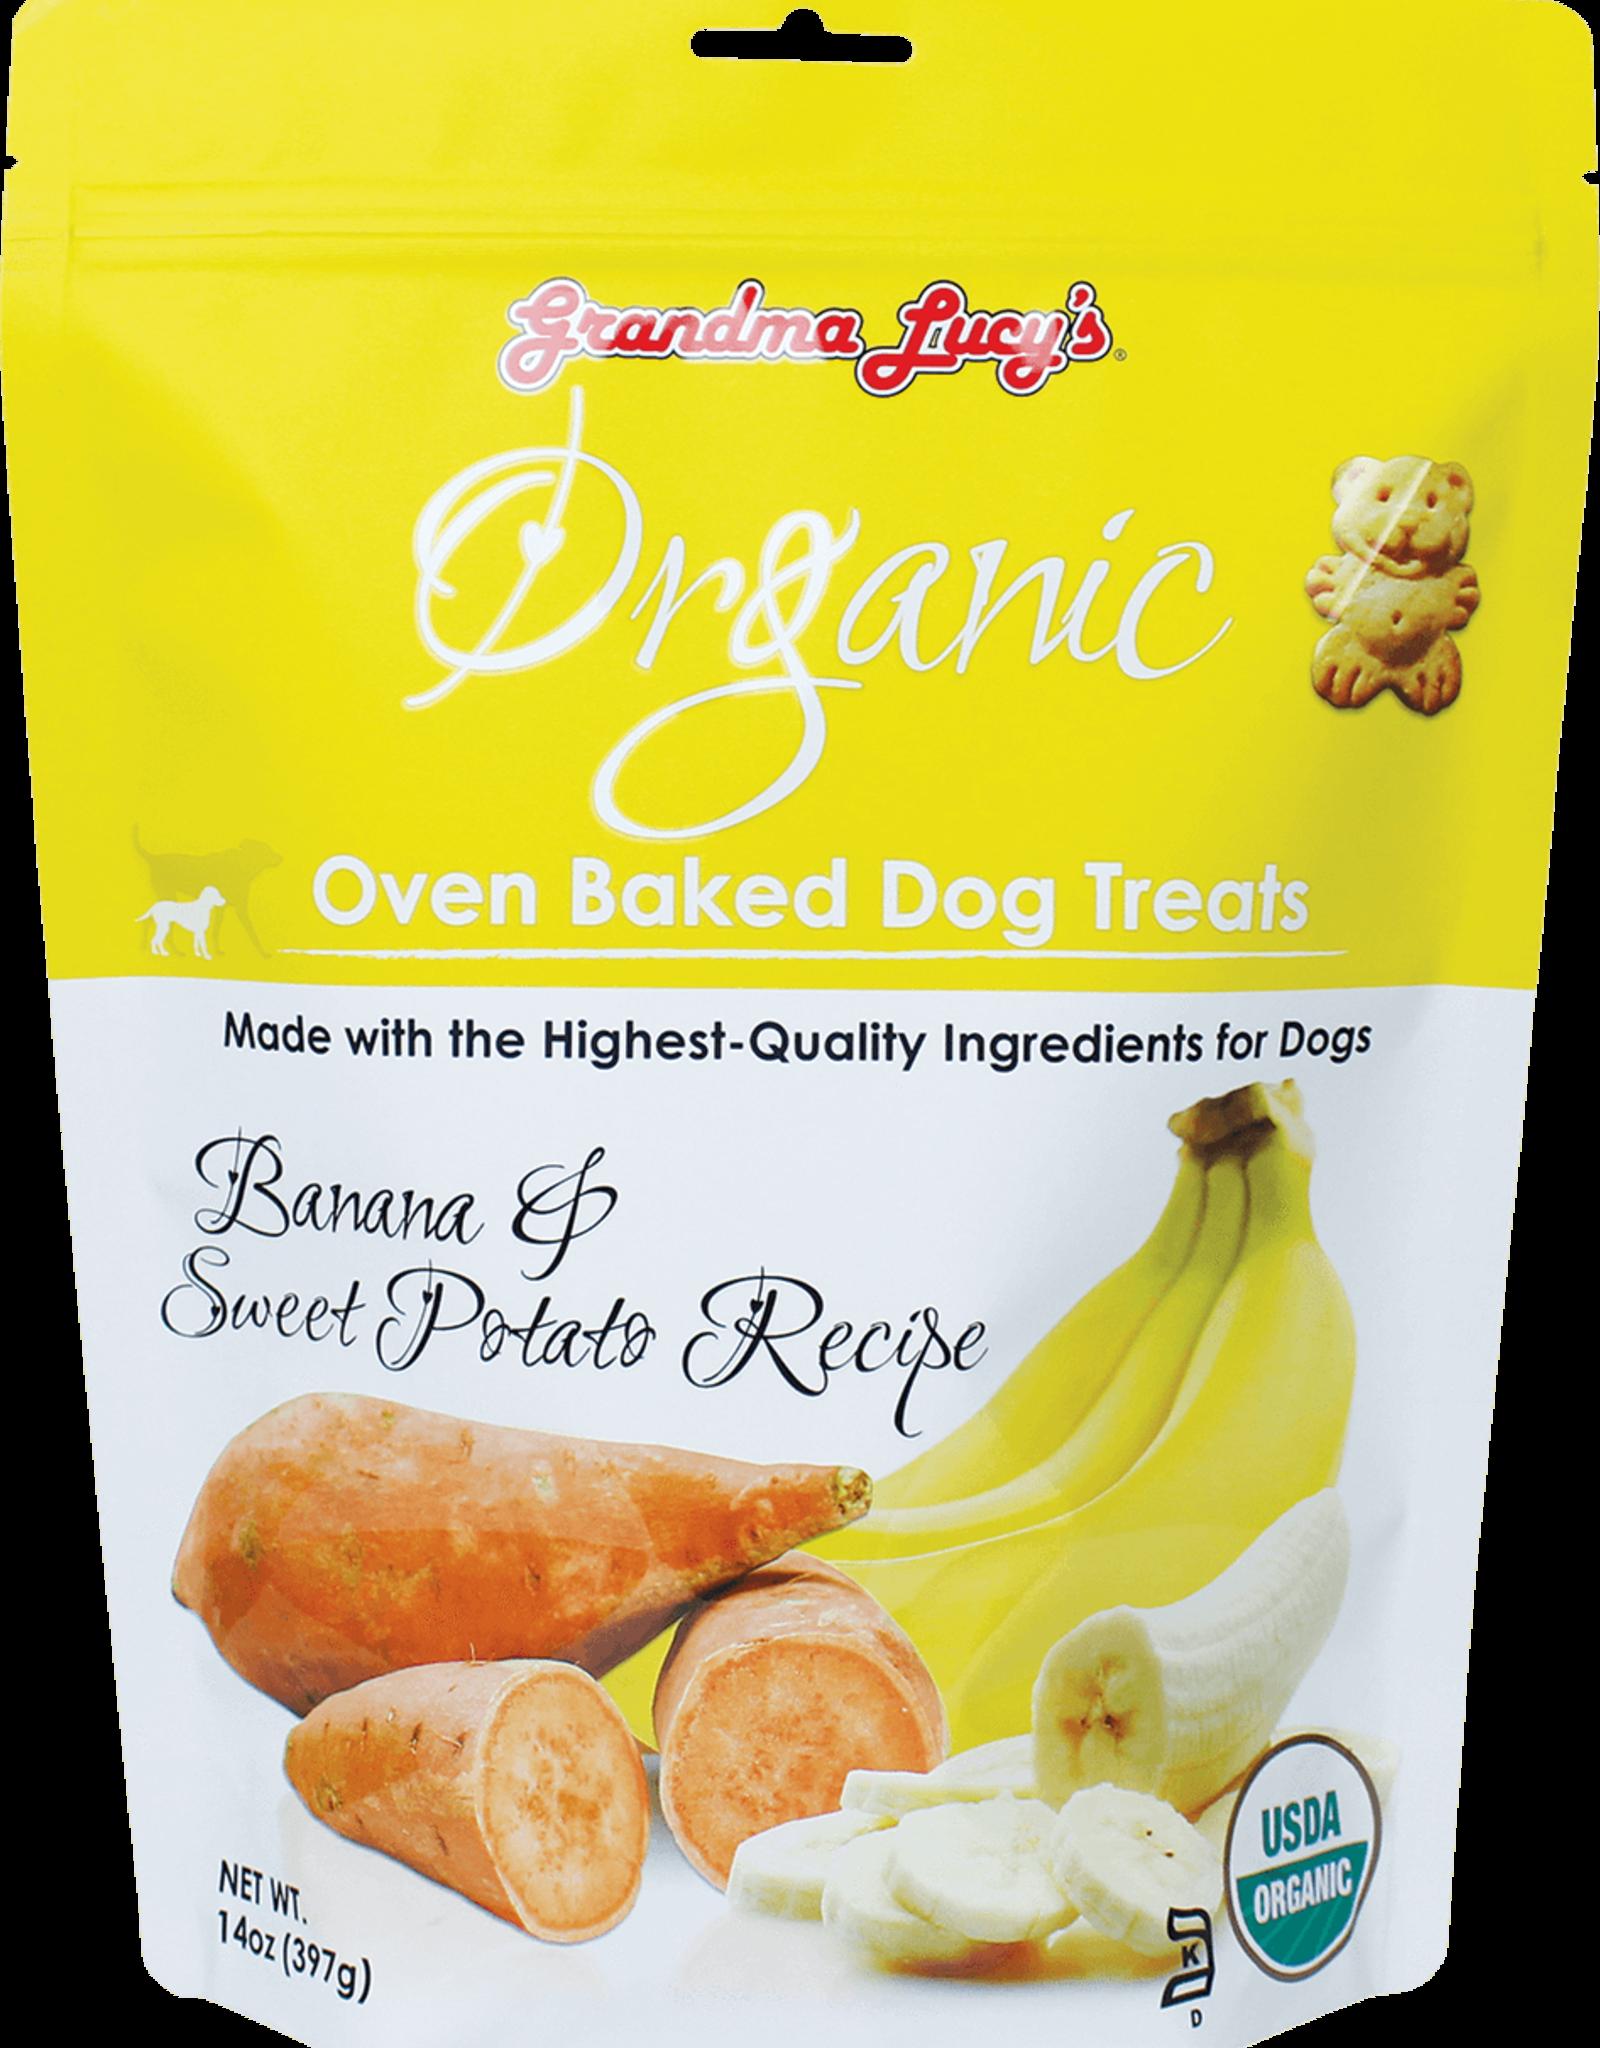 Grandma Lucy's Organic Banana & Sweet Potato Biscuit - 14oz